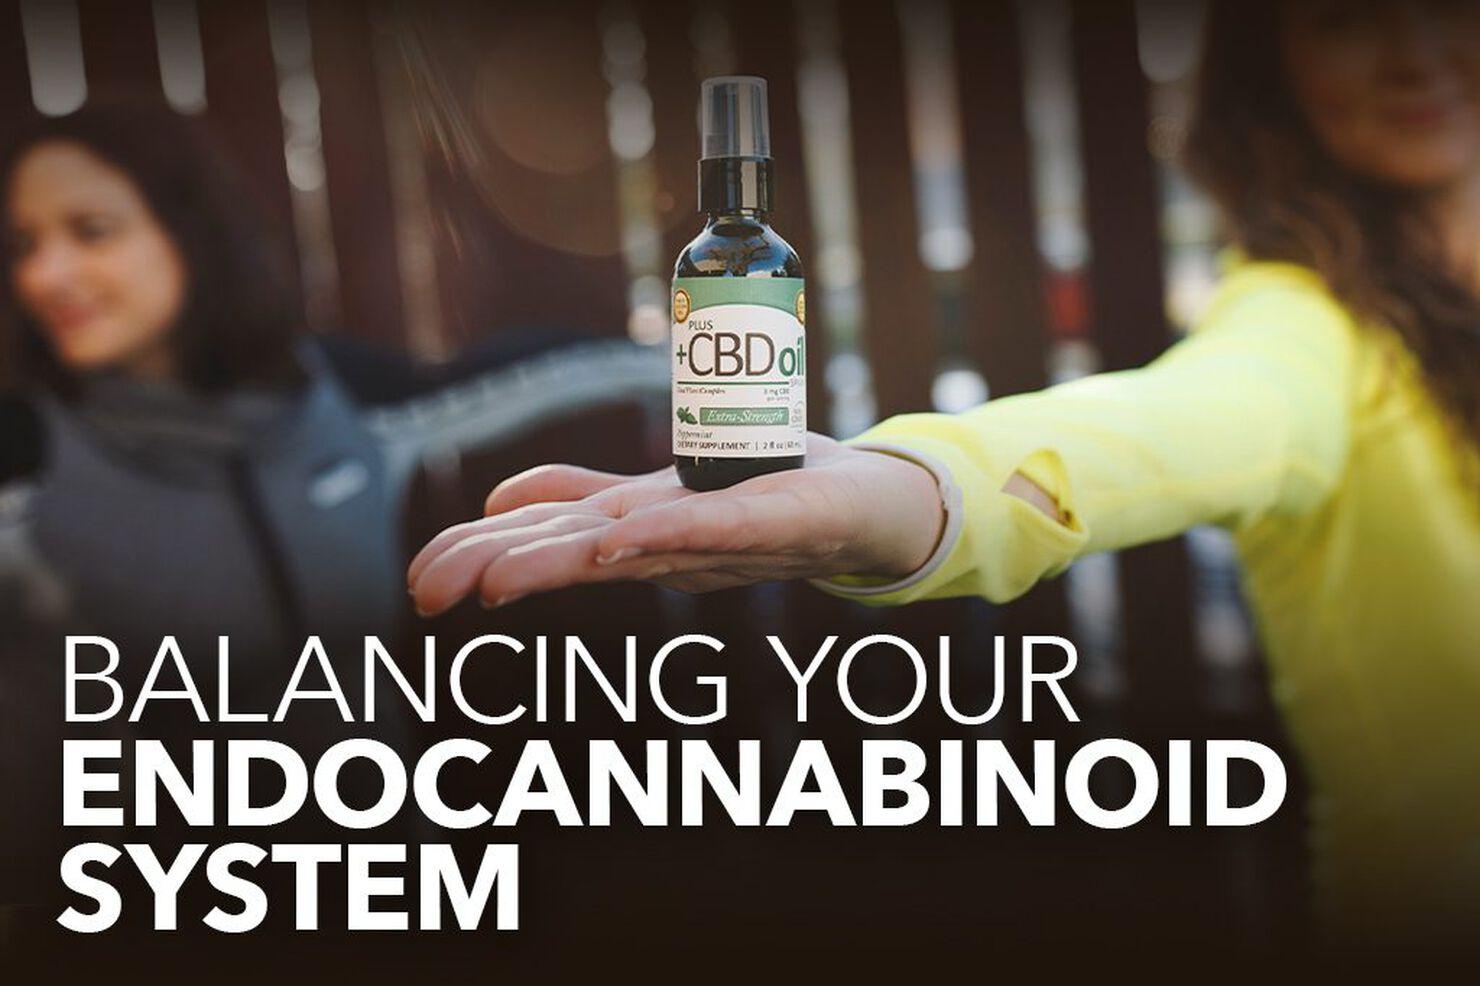 Balancing your Endocannabinoid System